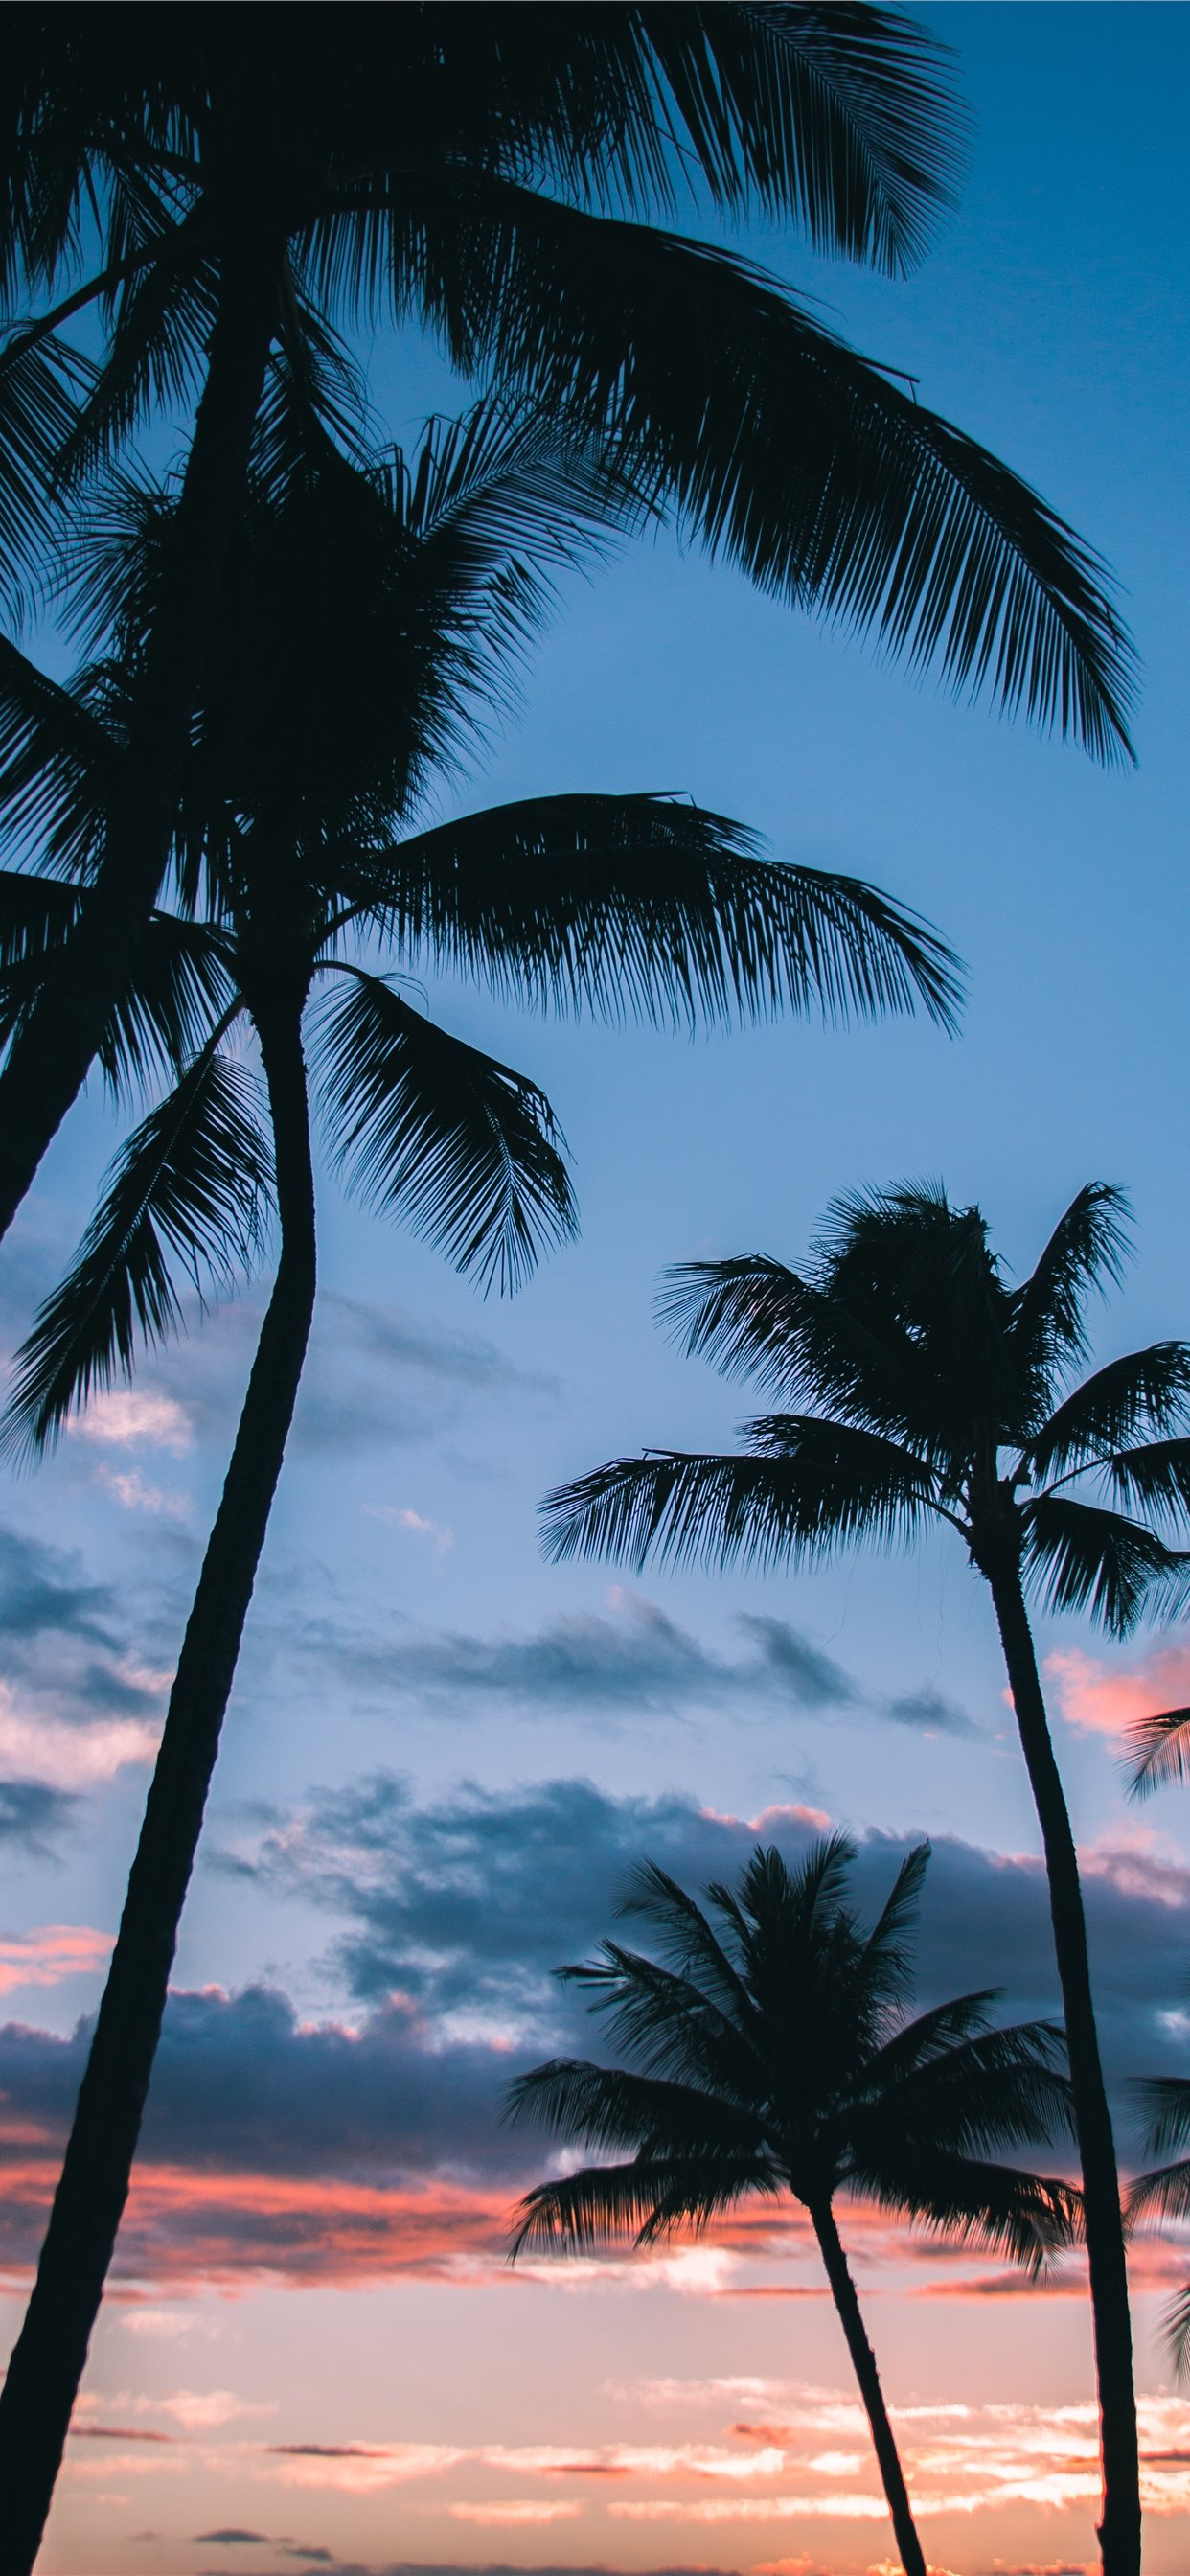 Palm Tree Wallpaper Iphone - HD Wallpaper